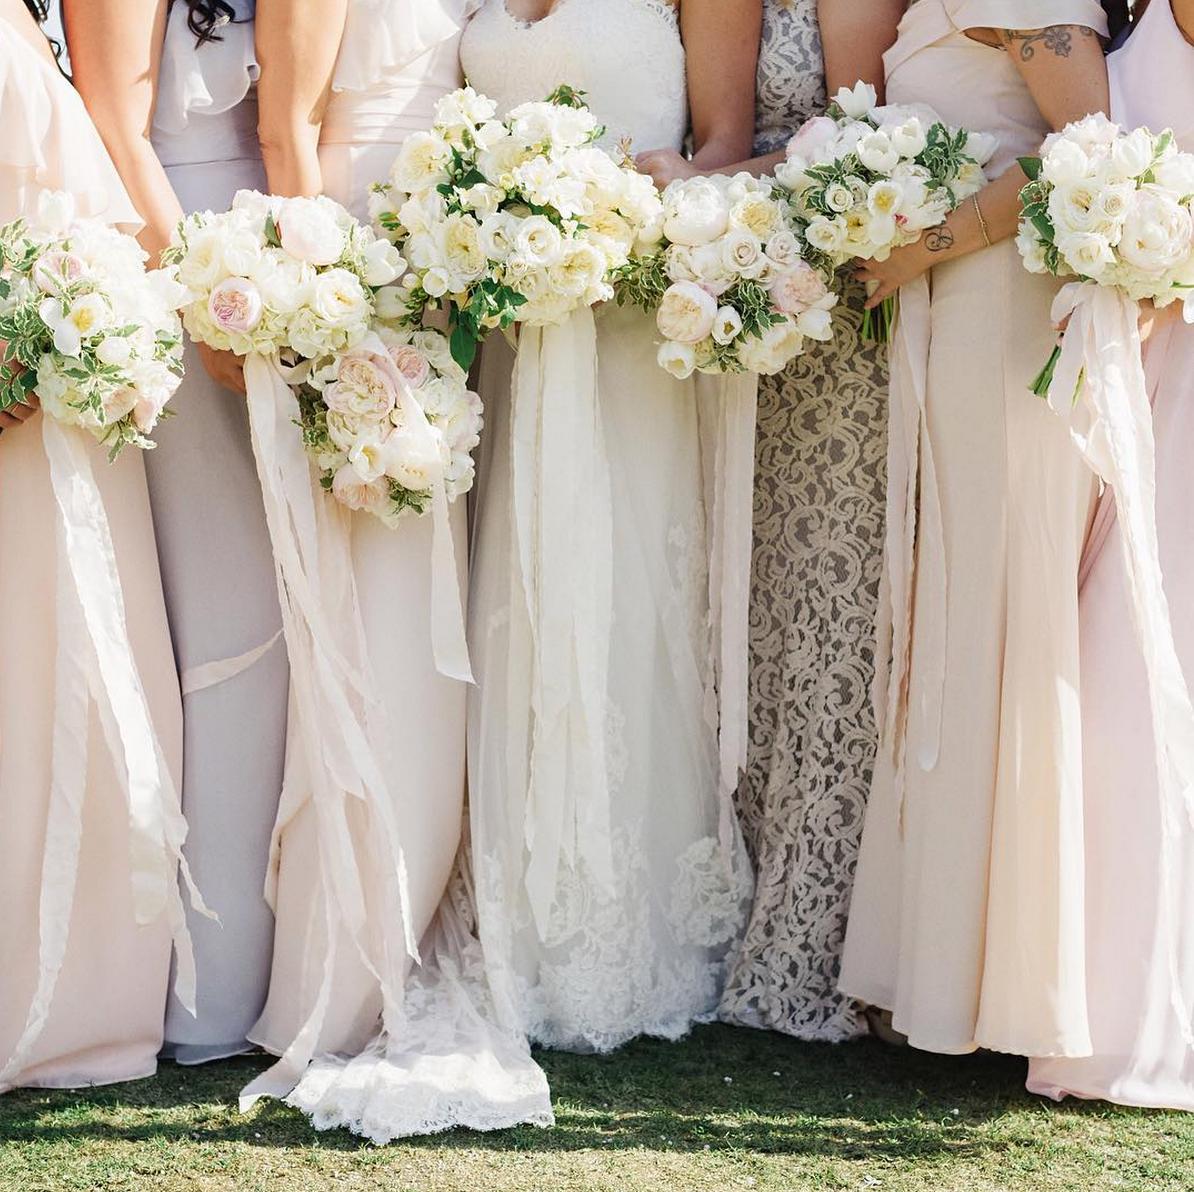 Wedding Flowers Keighley: Amazing Floral Designer, Perfect Photo, Wedding Flowers